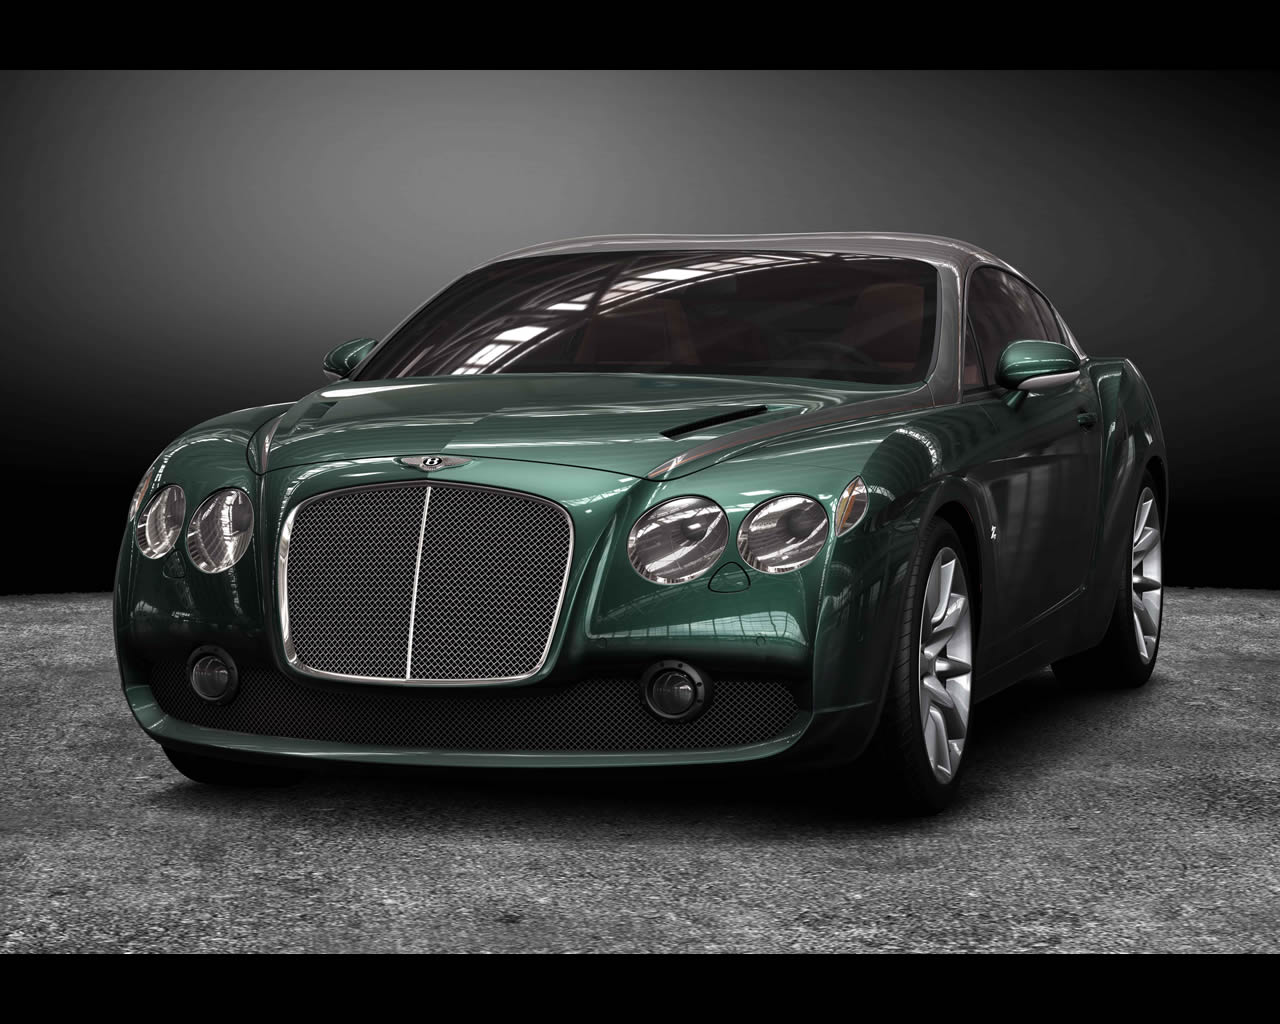 Bentley Gtz Zagato 2008